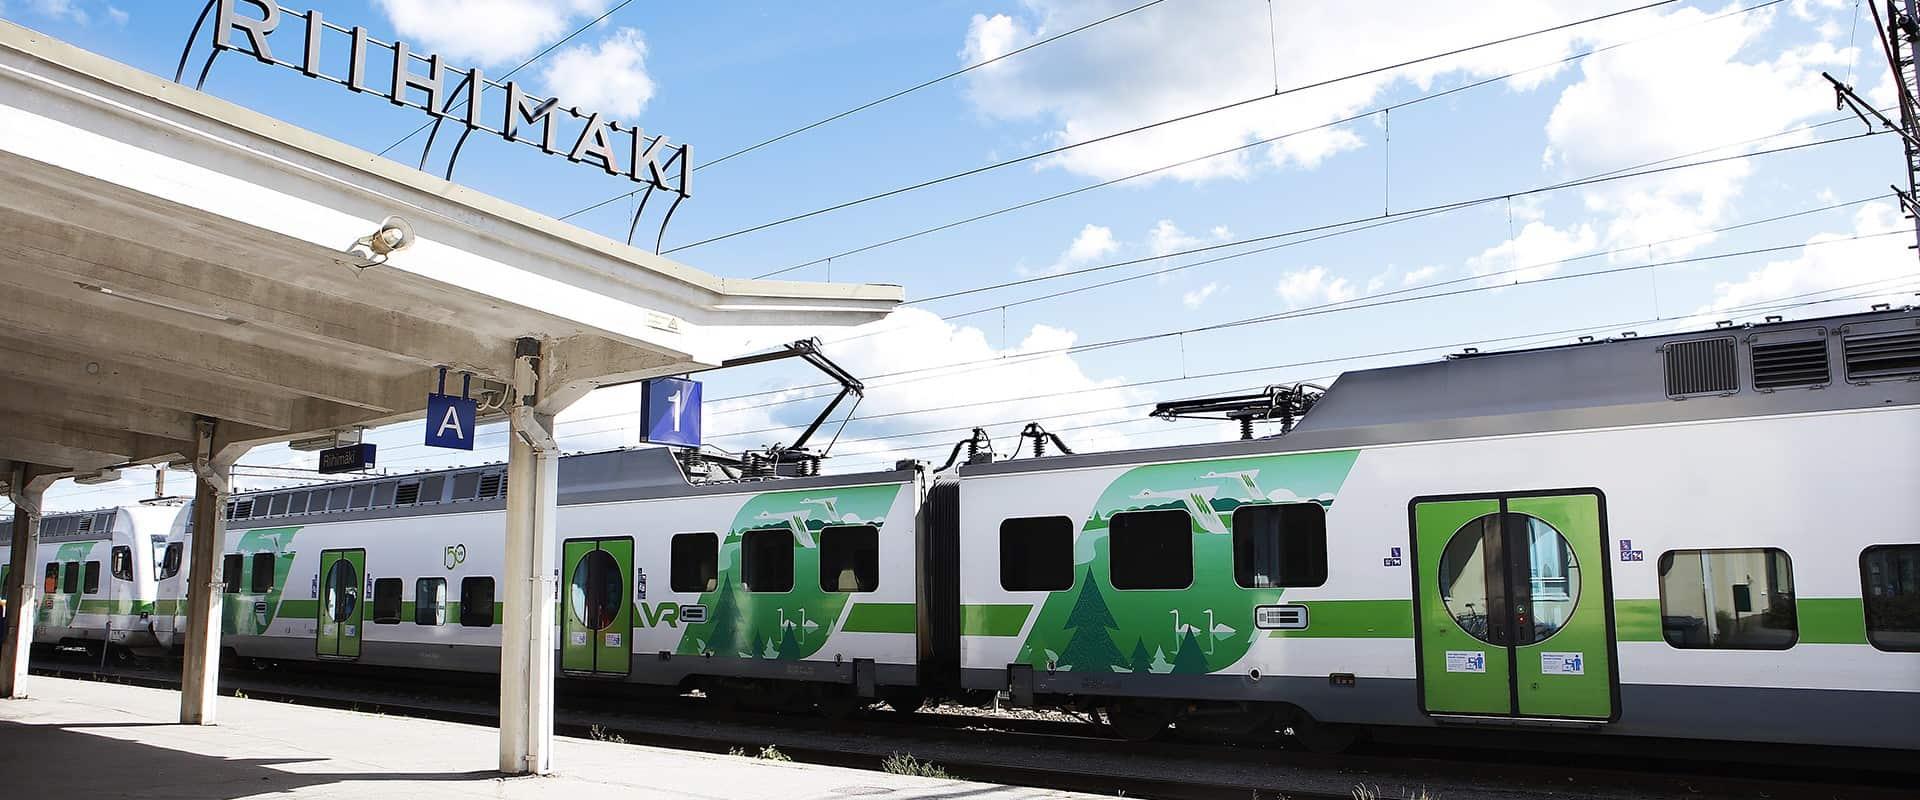 visit_hame_juna_riihimaki_junaasema_vr_rautatieasema_train_hameenlinna